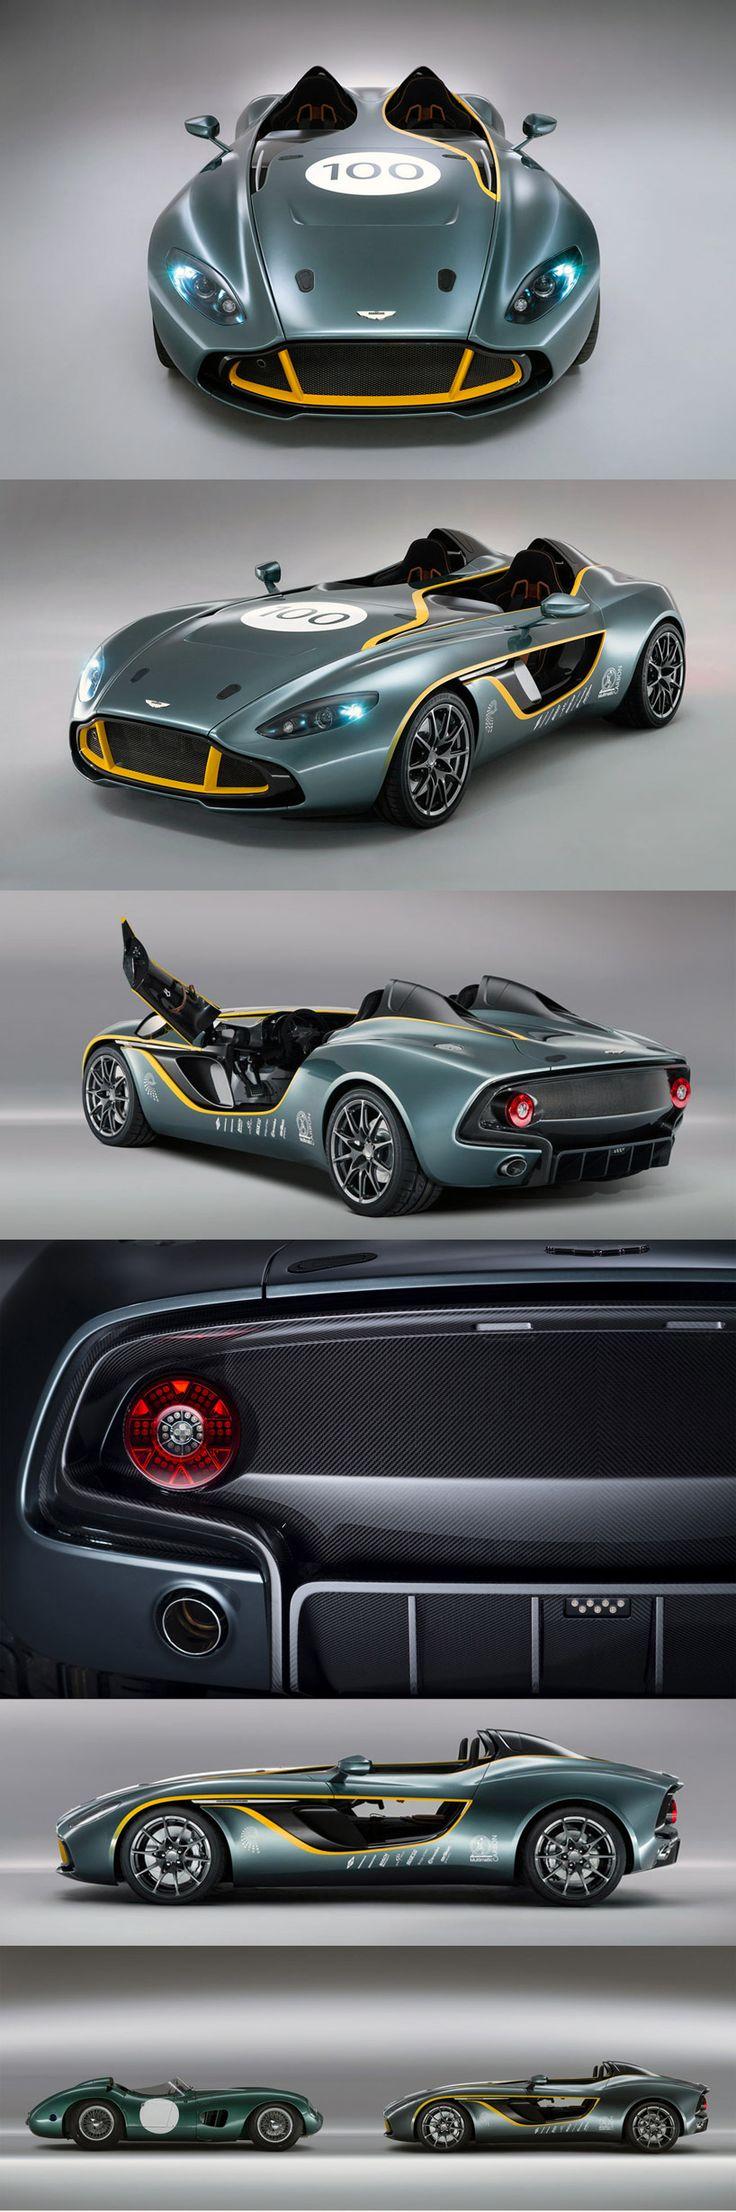 Premium vintage 1967 big amp tall men s big amp tall premium tank - Aston Martin Cc100 Speedster Concept